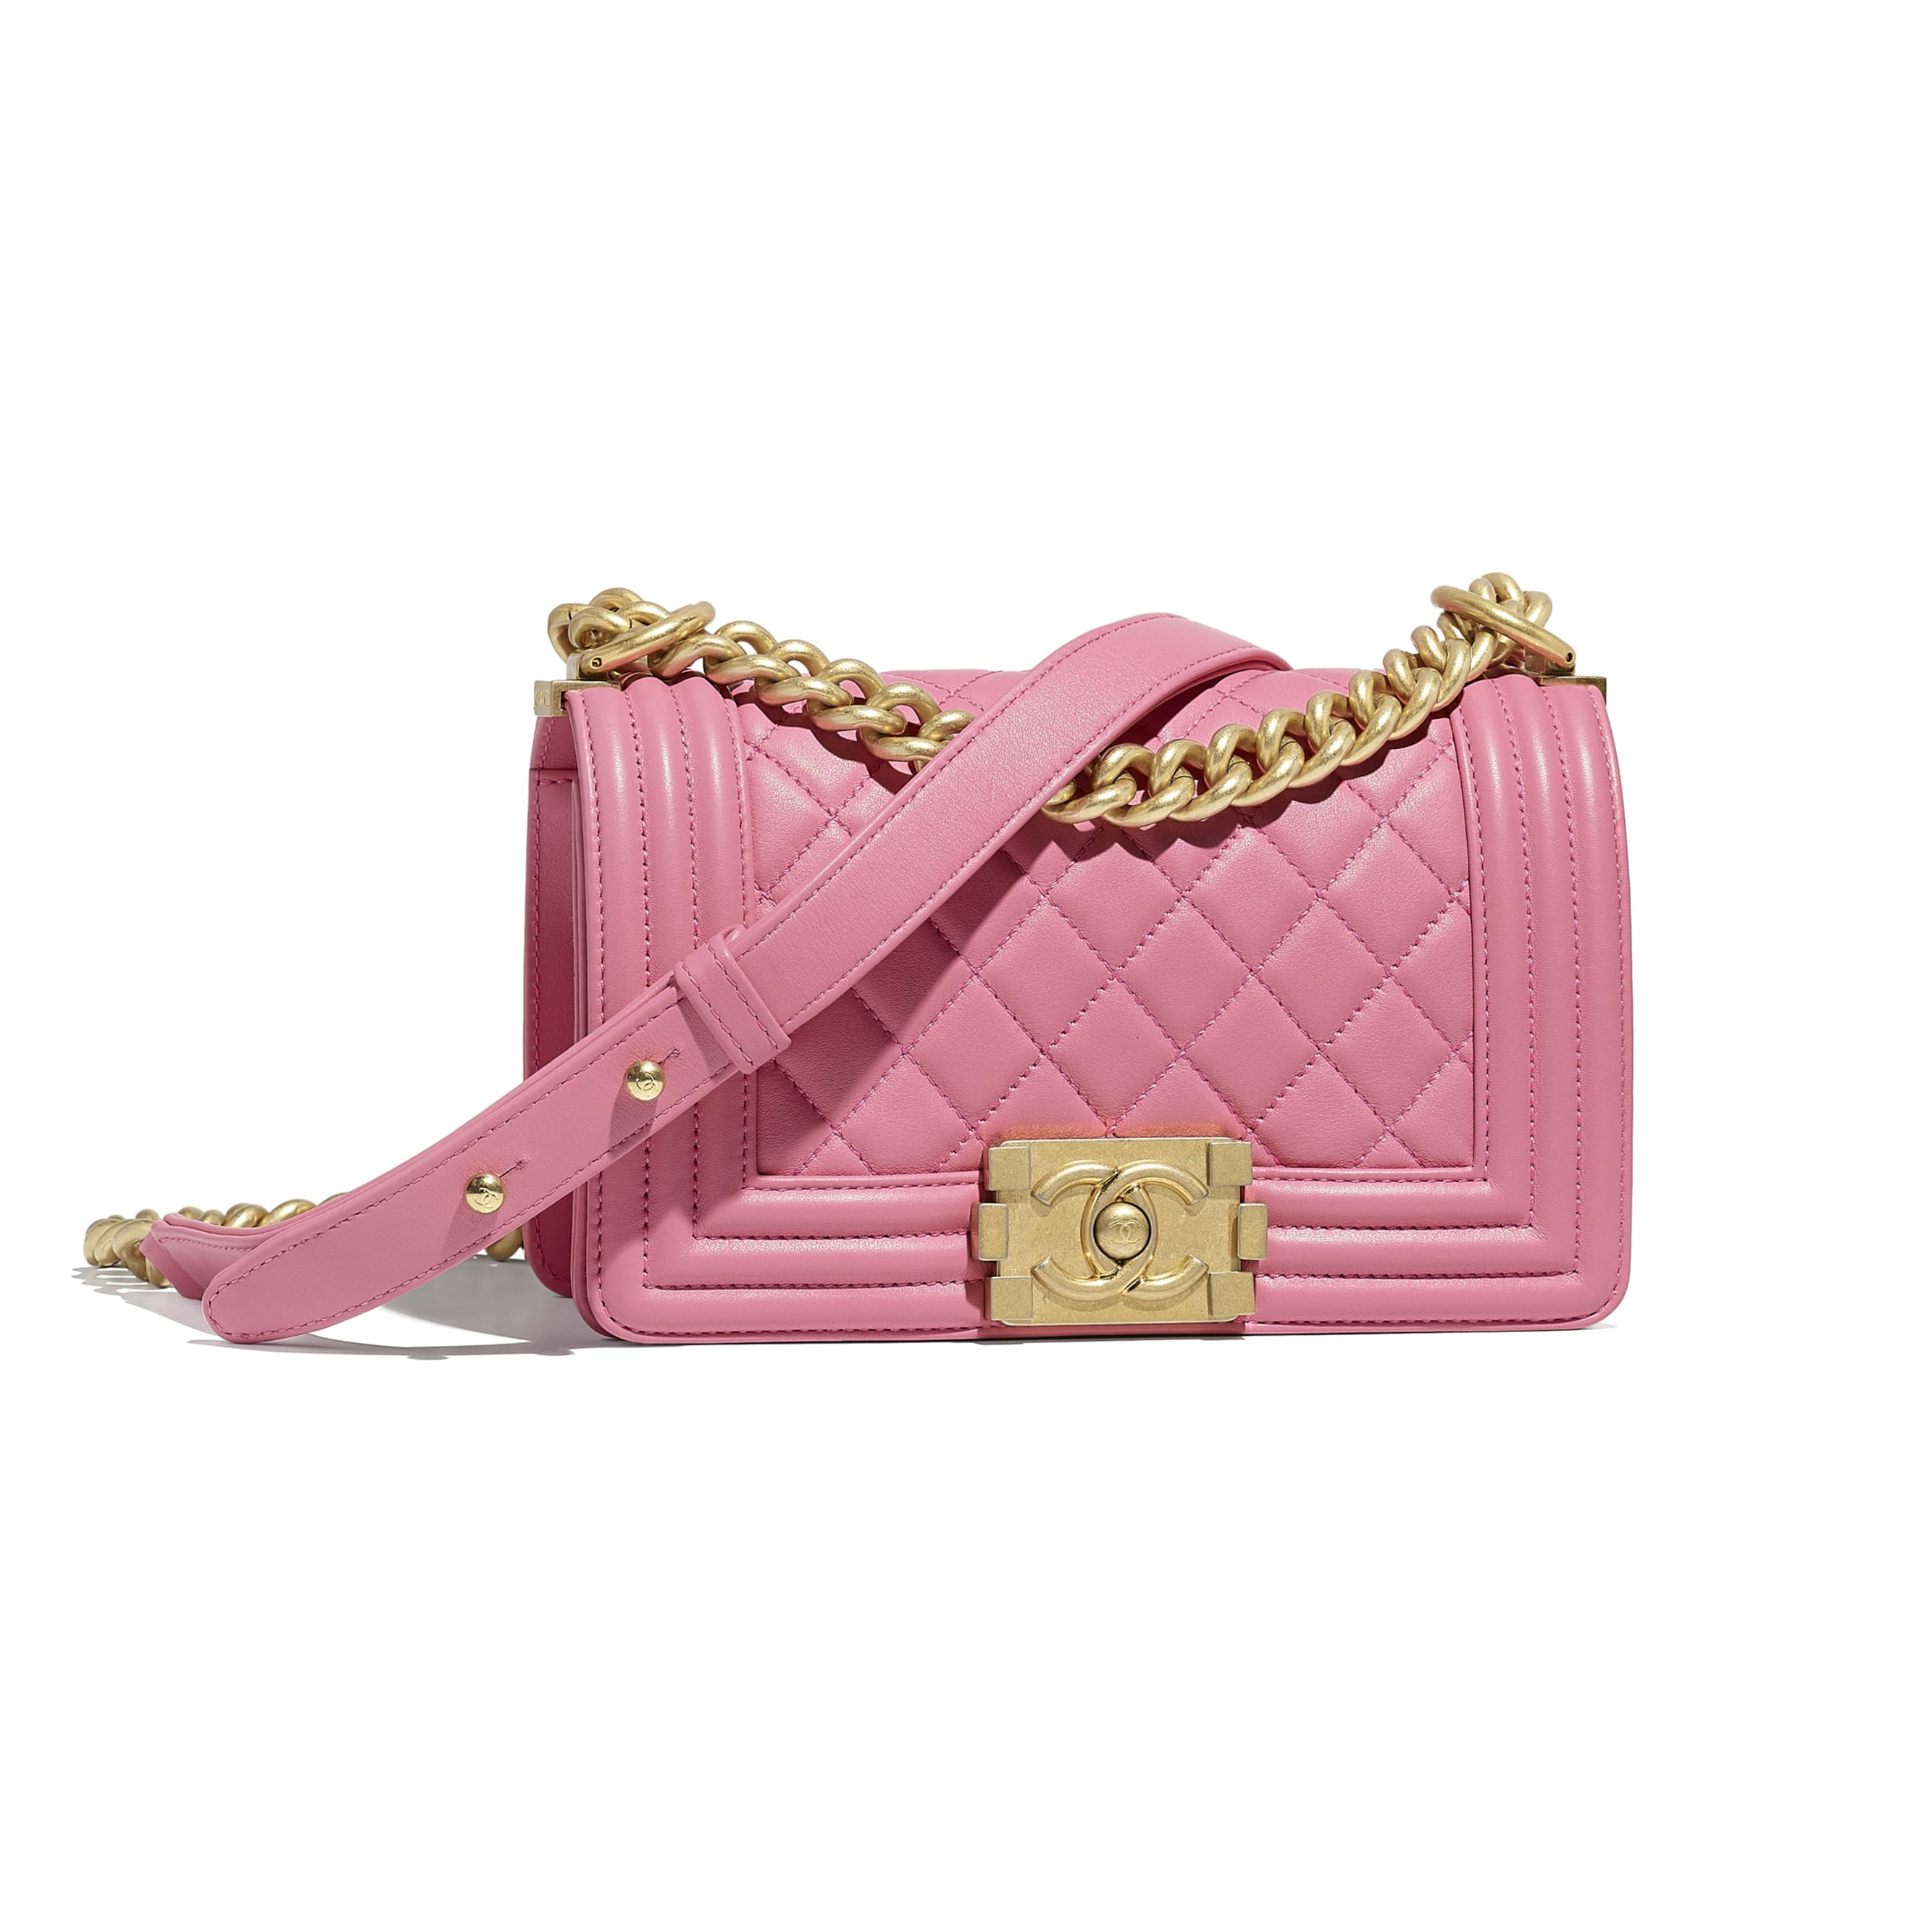 Small BOY CHANEL Handbag - Pink - Calfskin & Gold-Tone Metal - Default view - see standard sized version